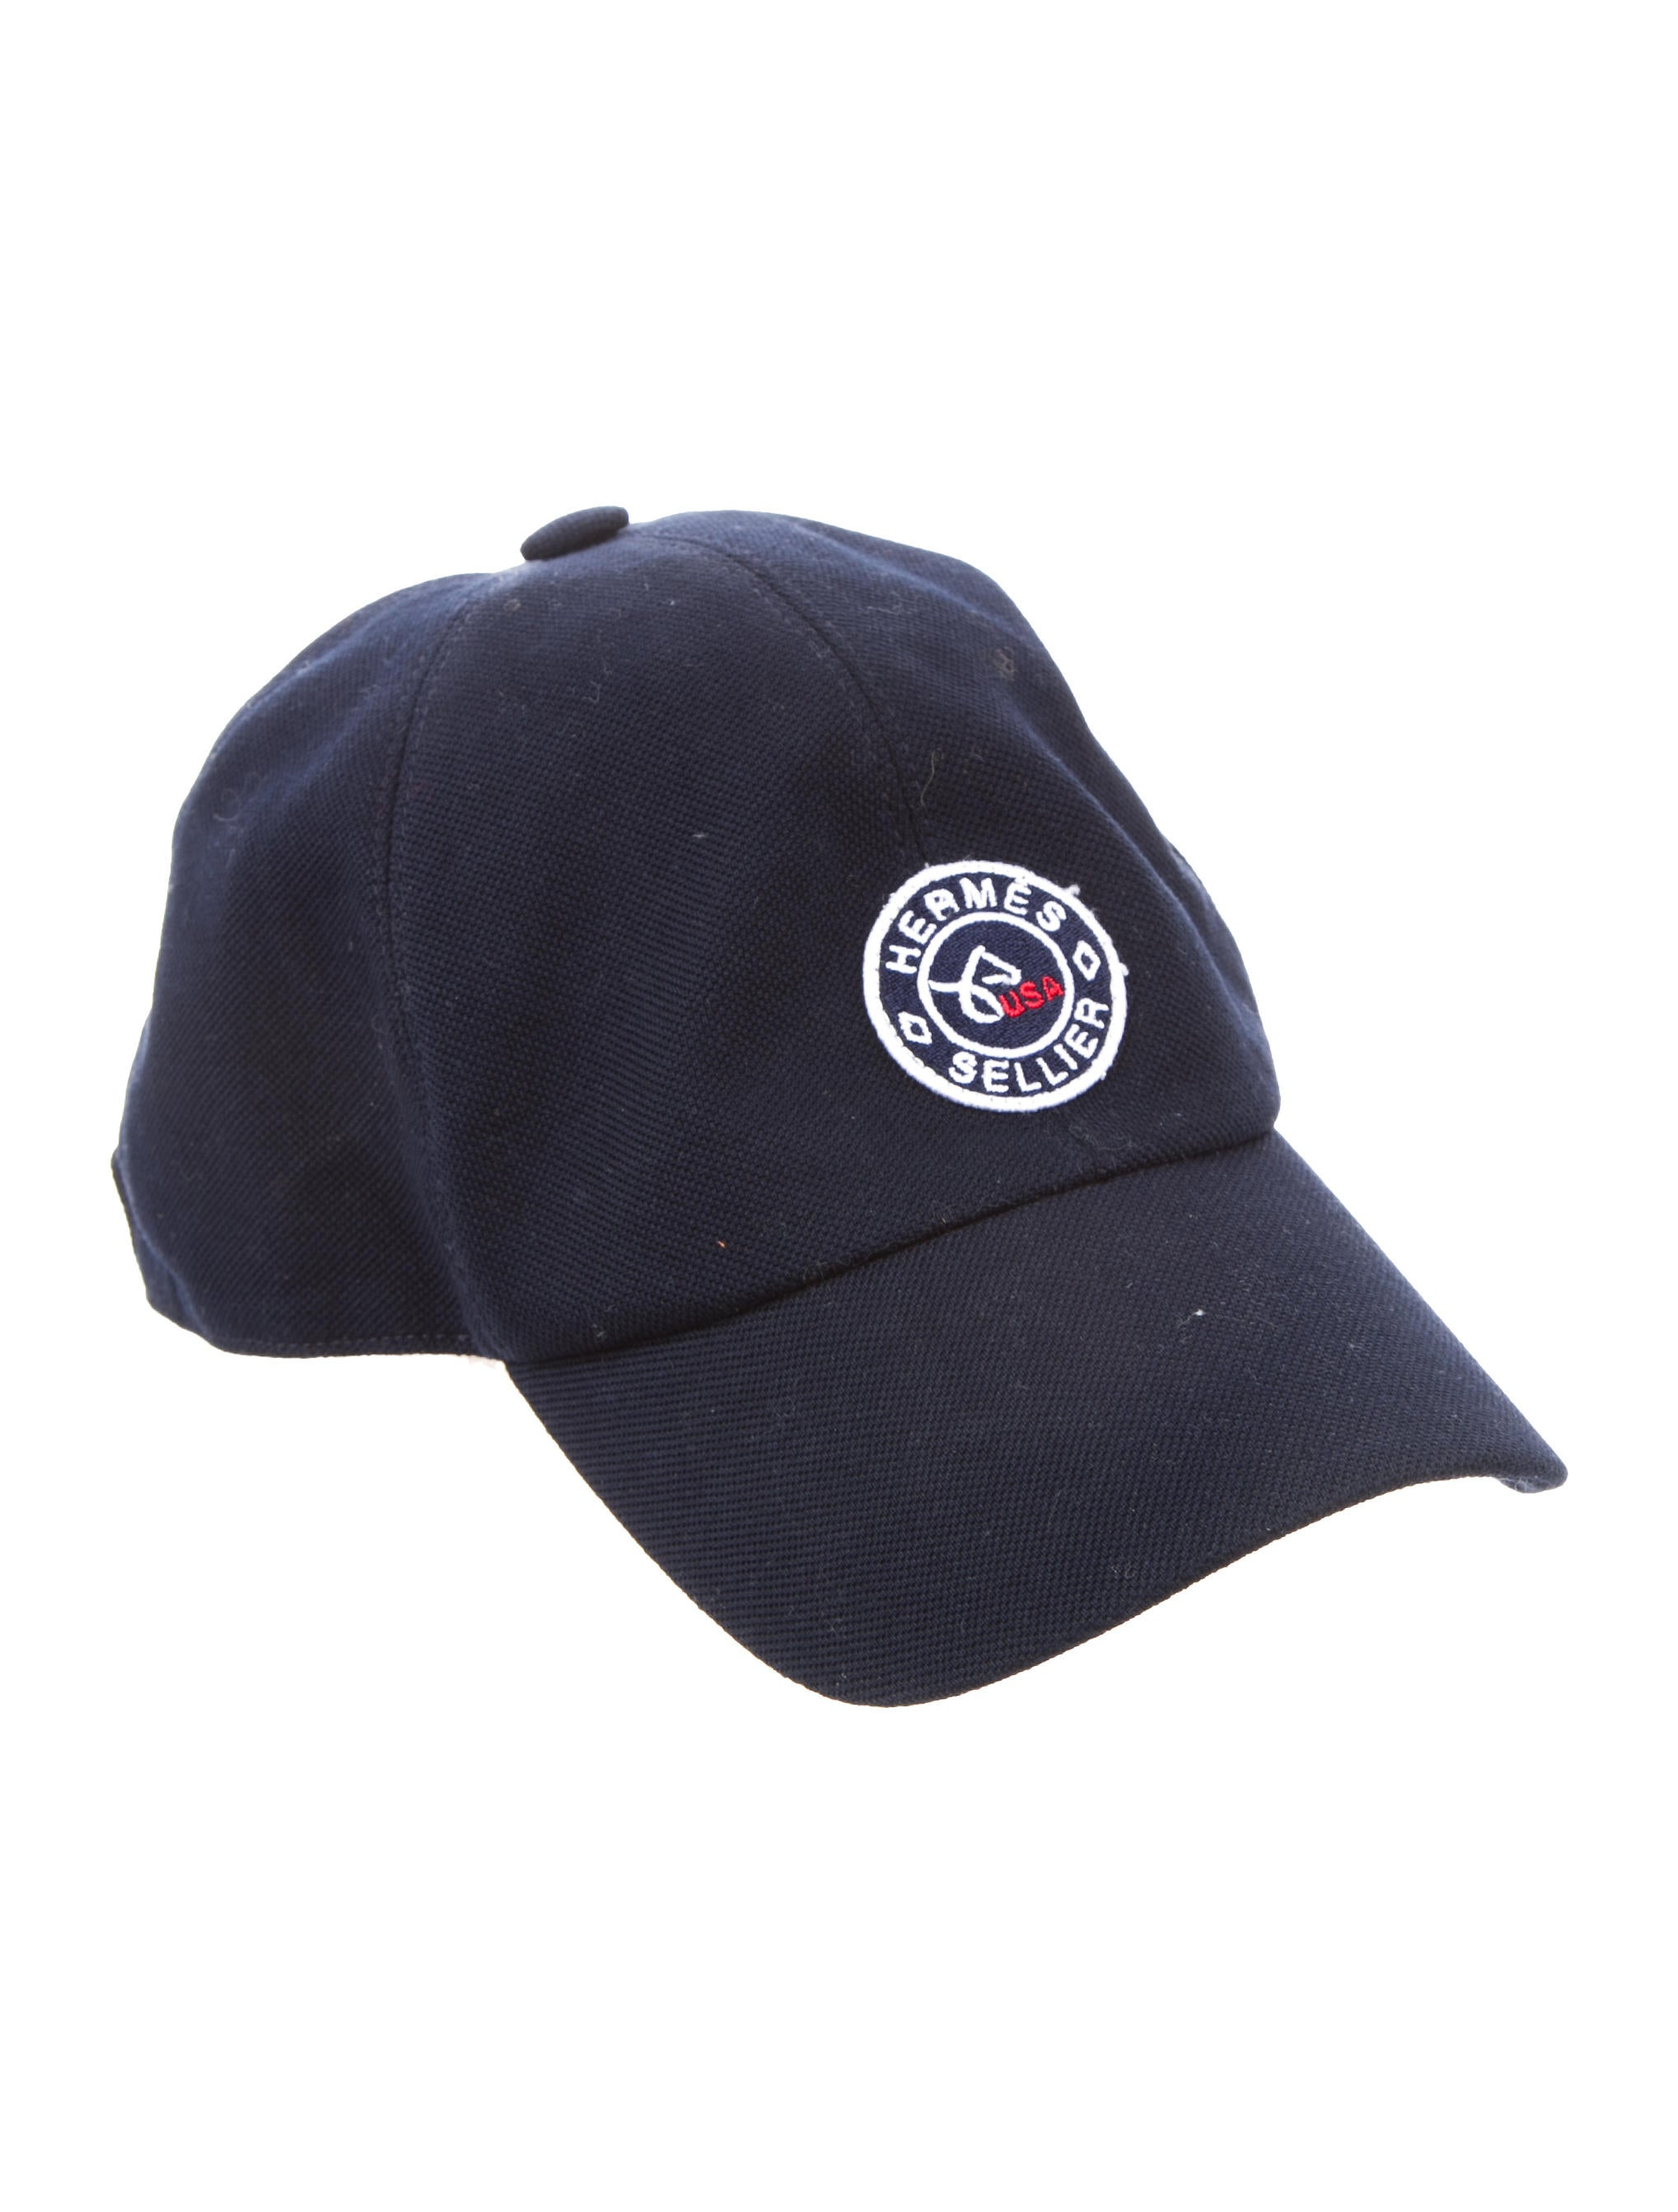 Hermès USEF Baseball Hat - Accessories - HER67709  c8b296b58ef